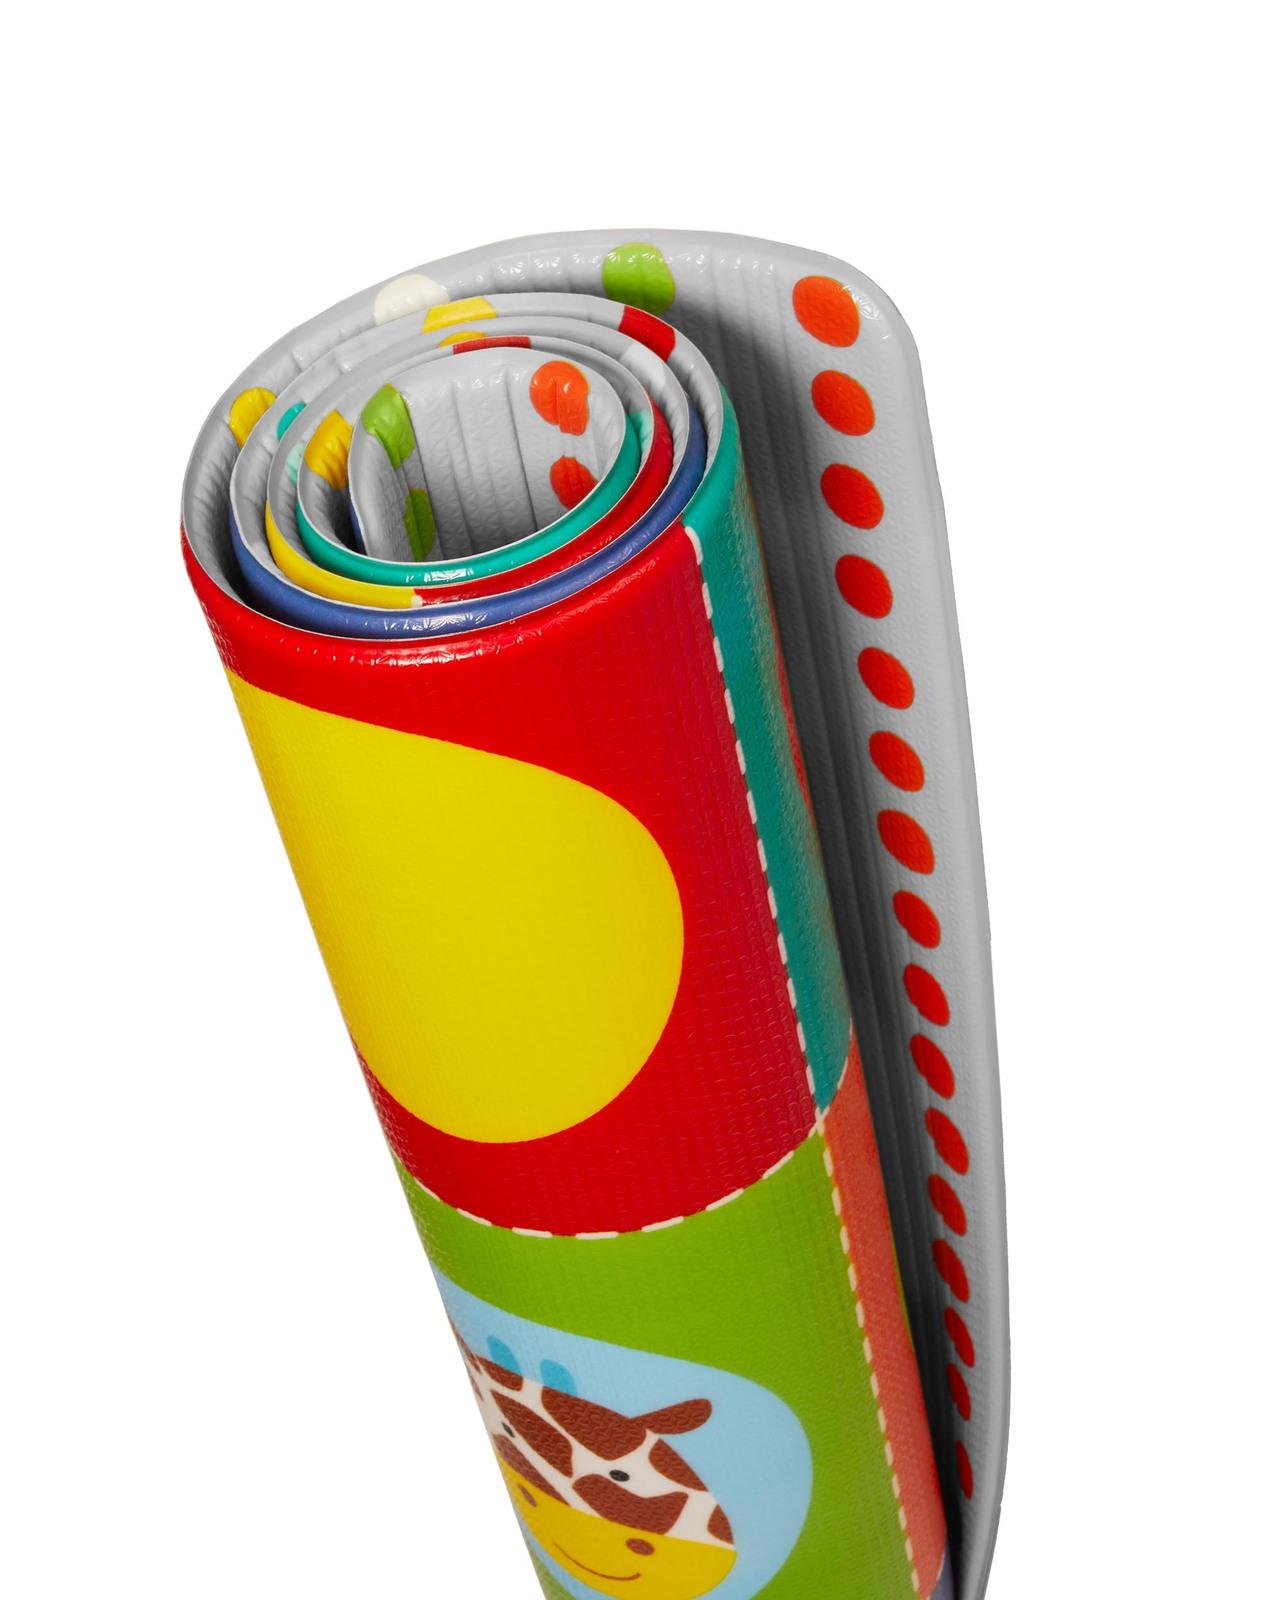 Skip Hop: Doubleplay Reversible Playmat - Zoo image